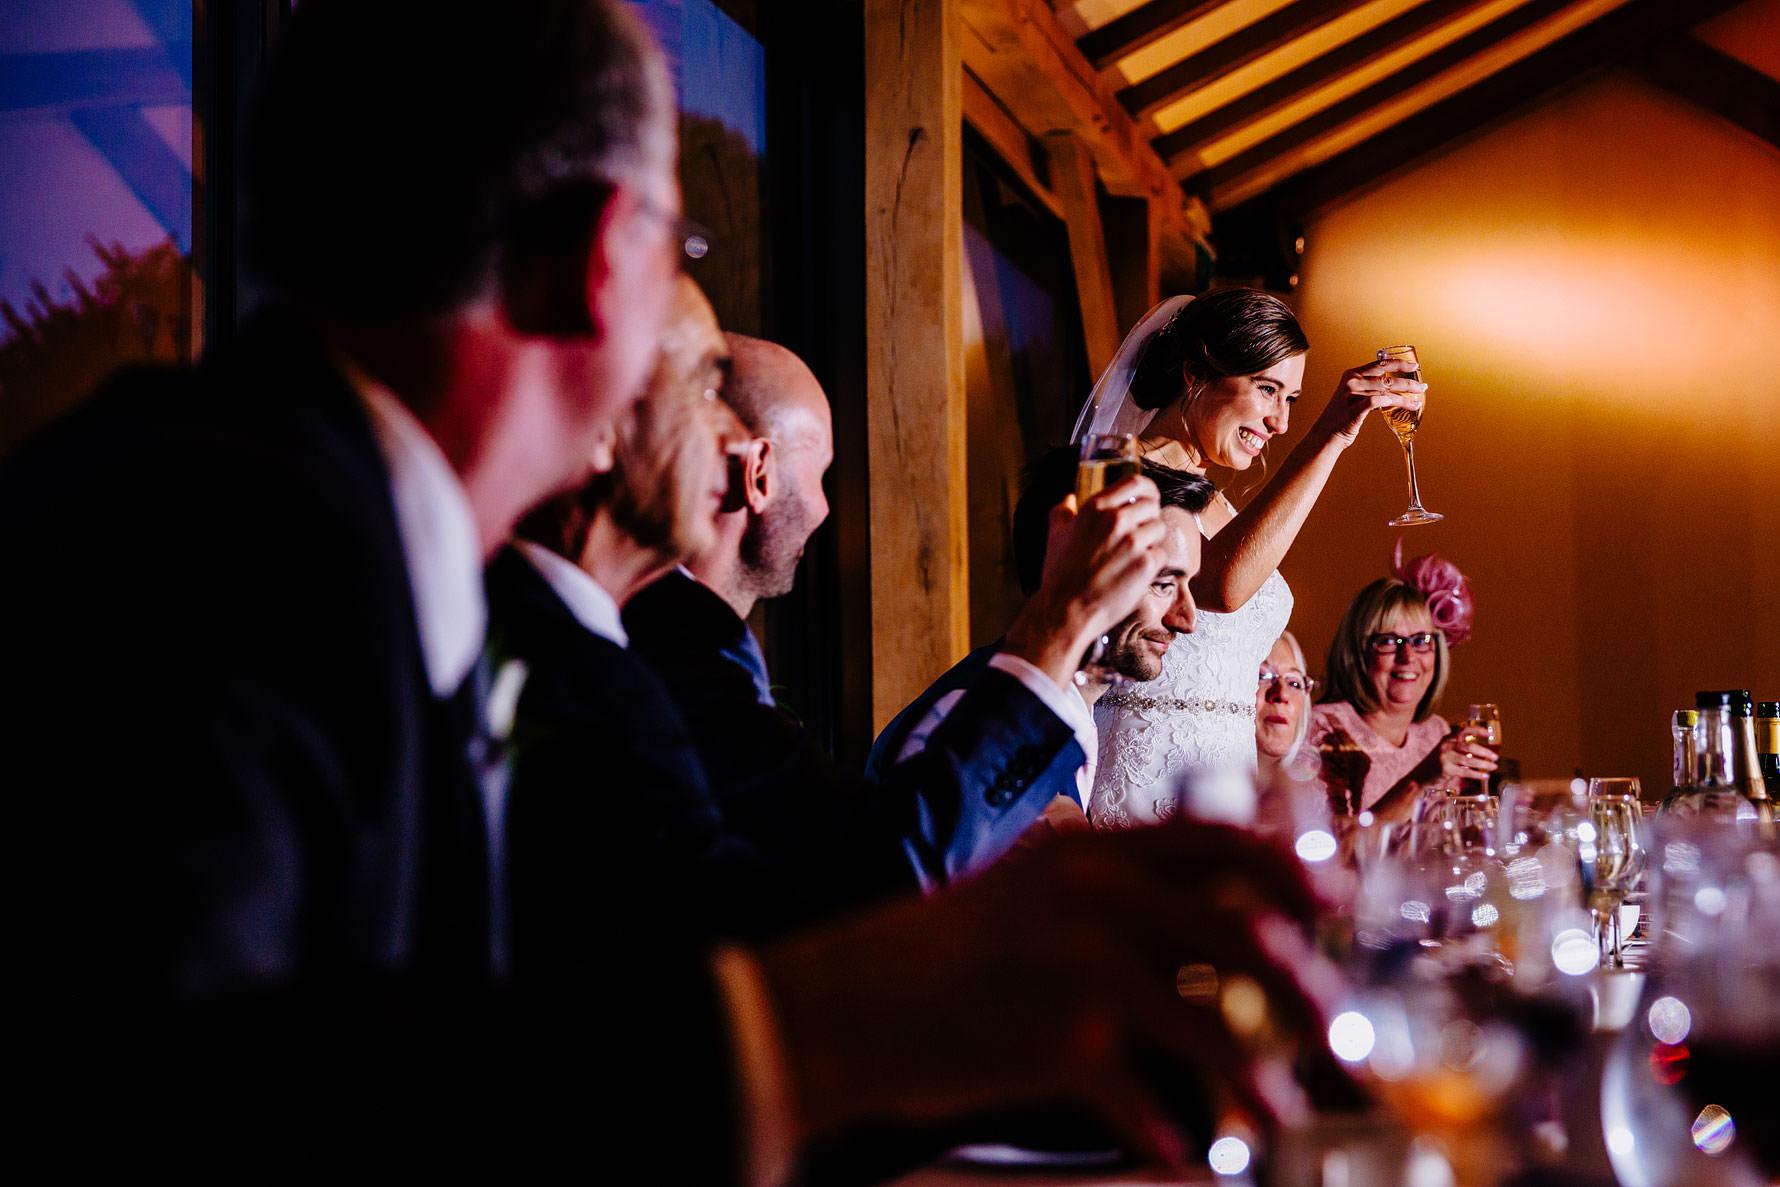 the bride delivers her wedding speech